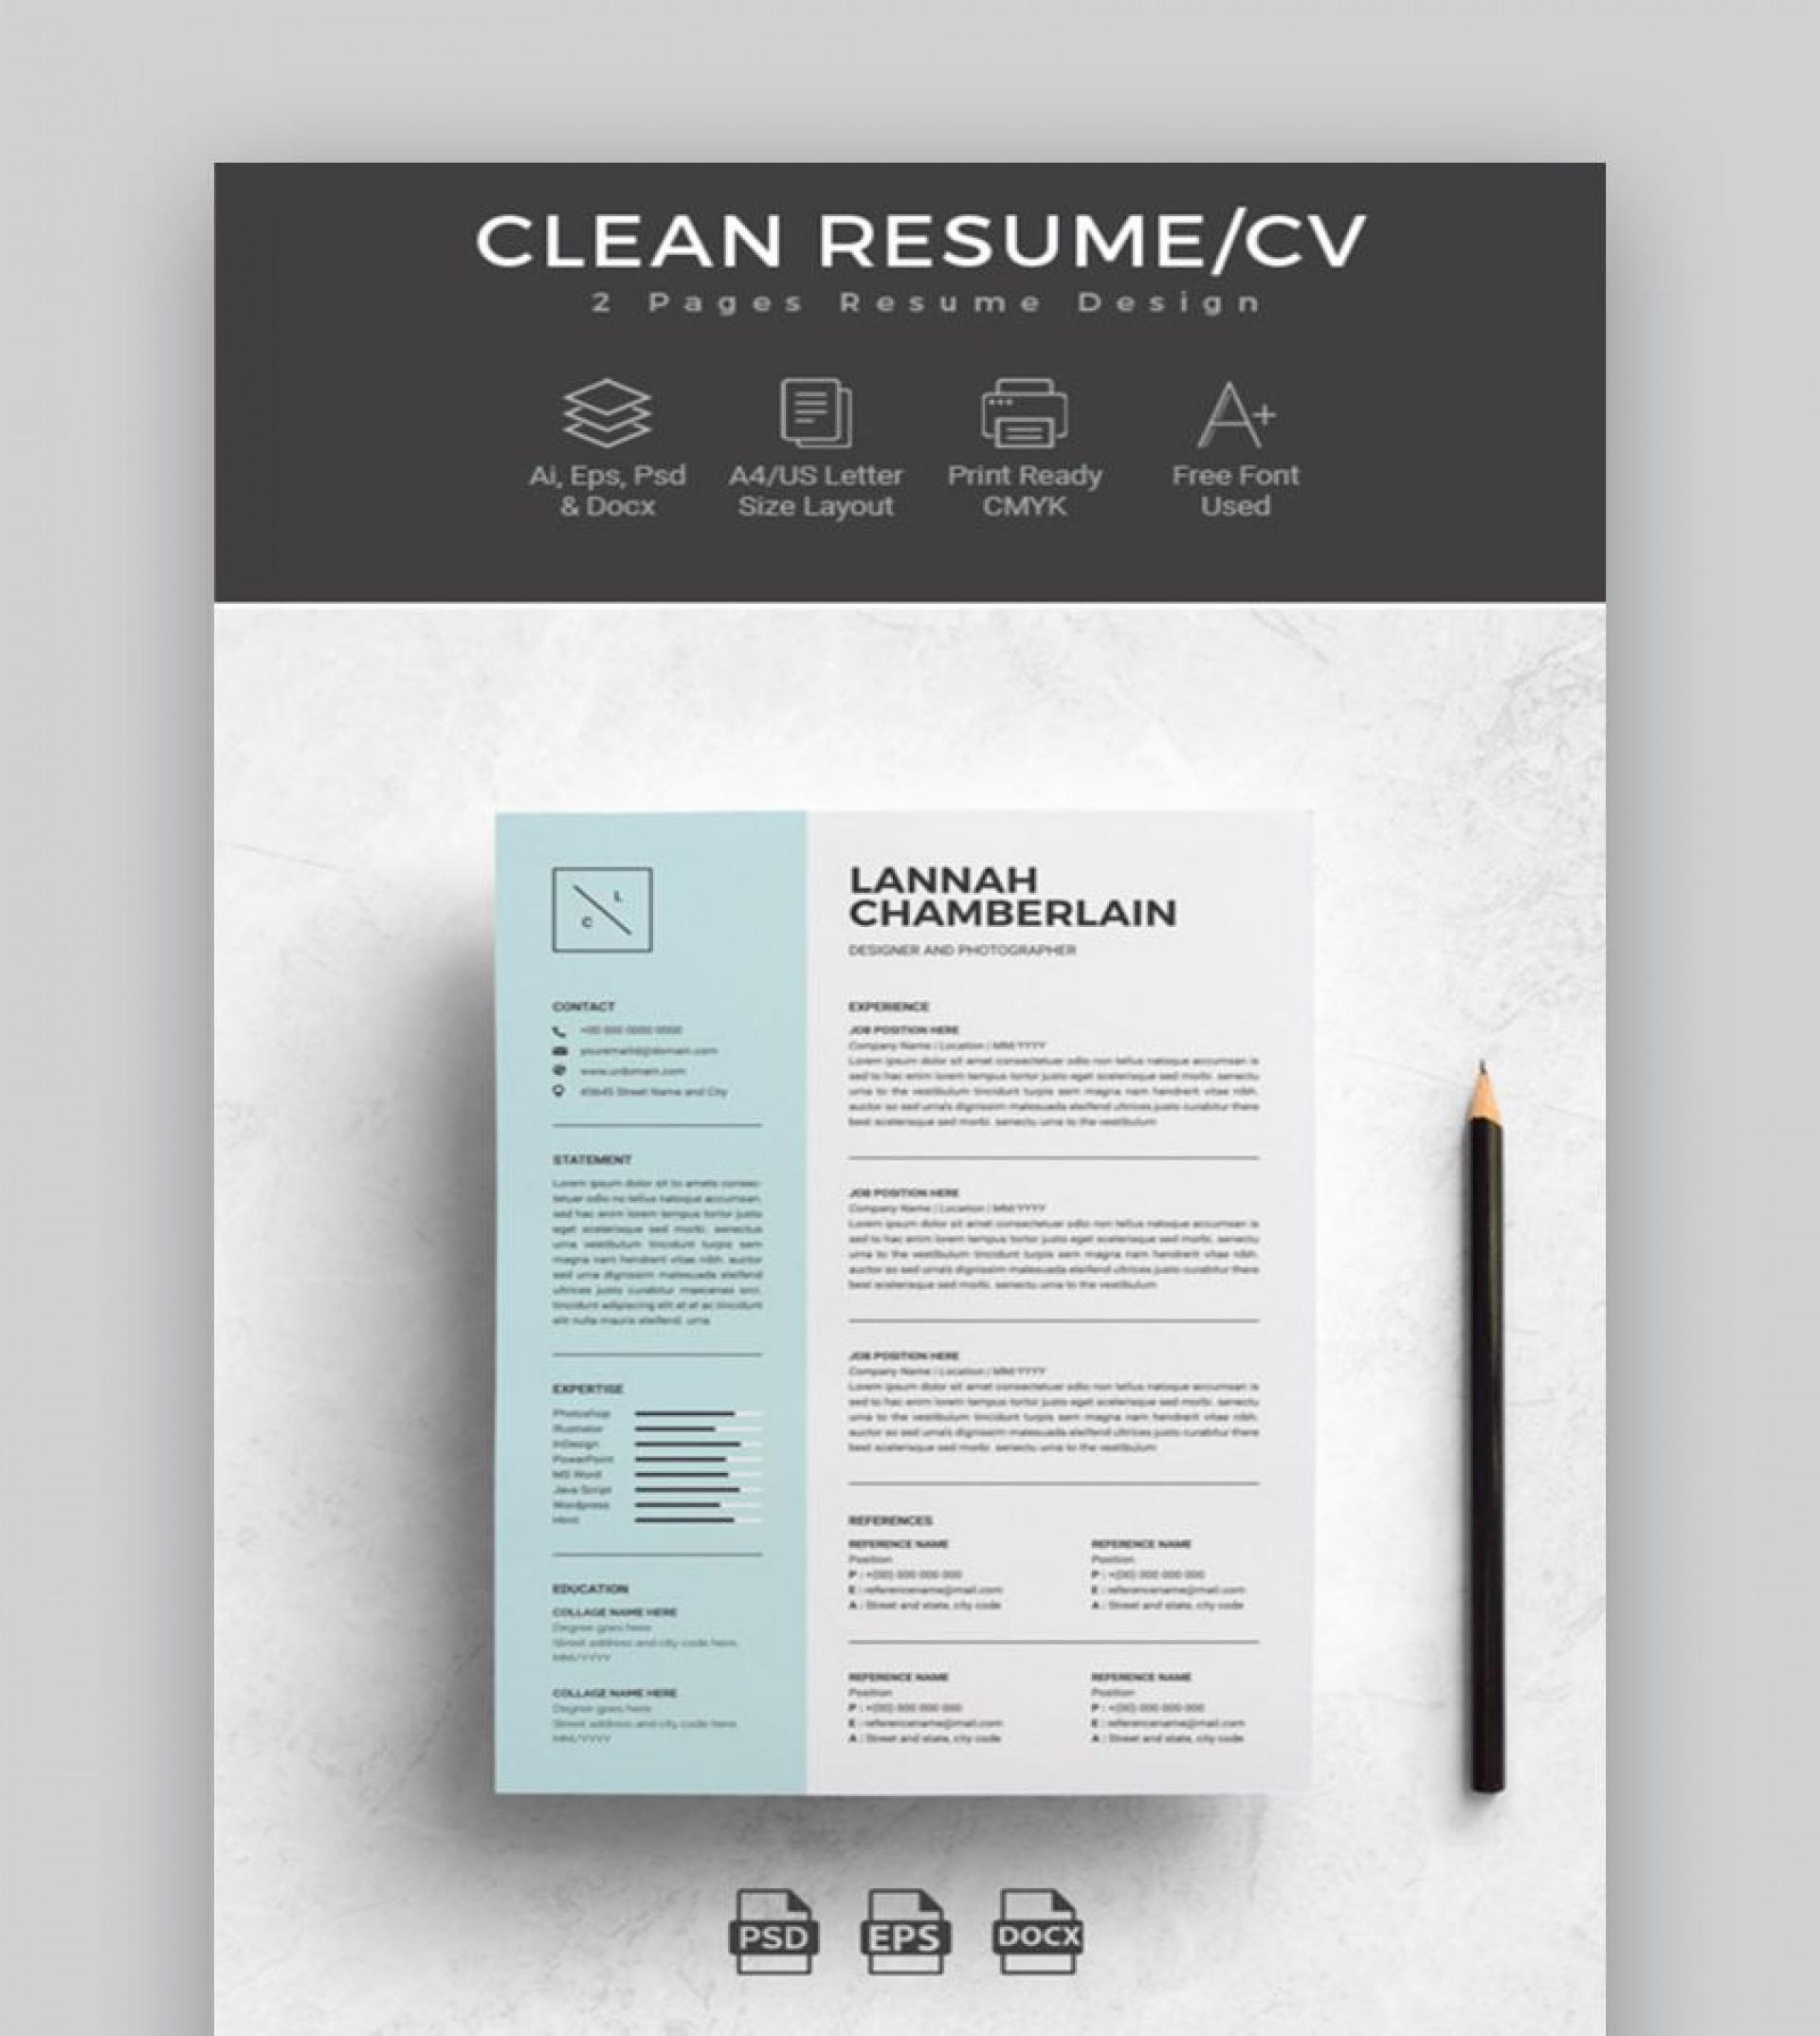 002 Wonderful Word Resume Template Mac High Resolution  2008 Microsoft 20111920